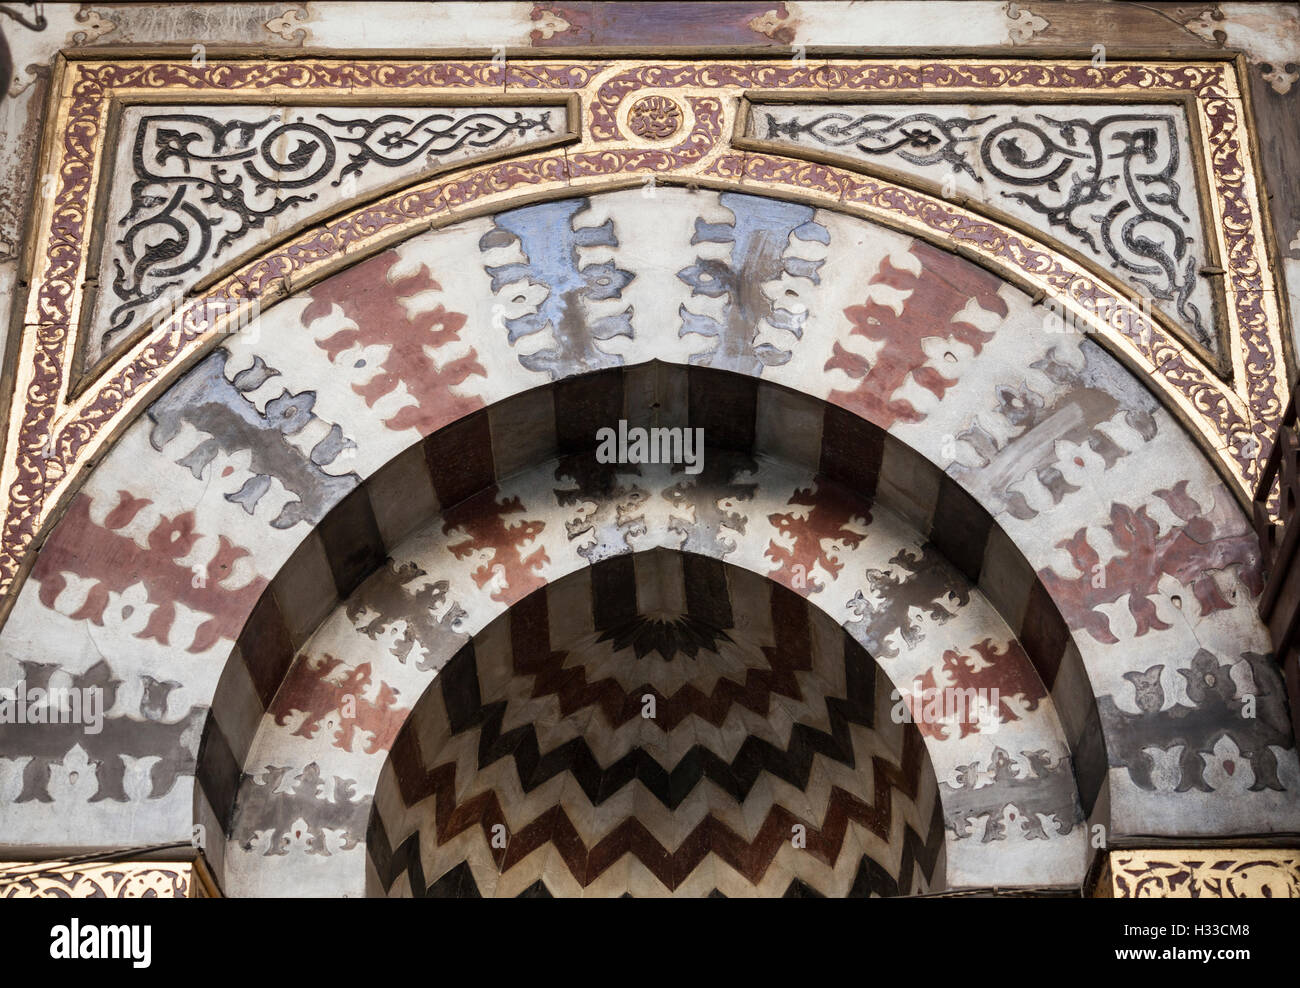 detail of mihrab, Madrasa of Yusuf ibn Ahmad Jamal al-Din al-Ustadar, Cairo, Egypt - Stock Image